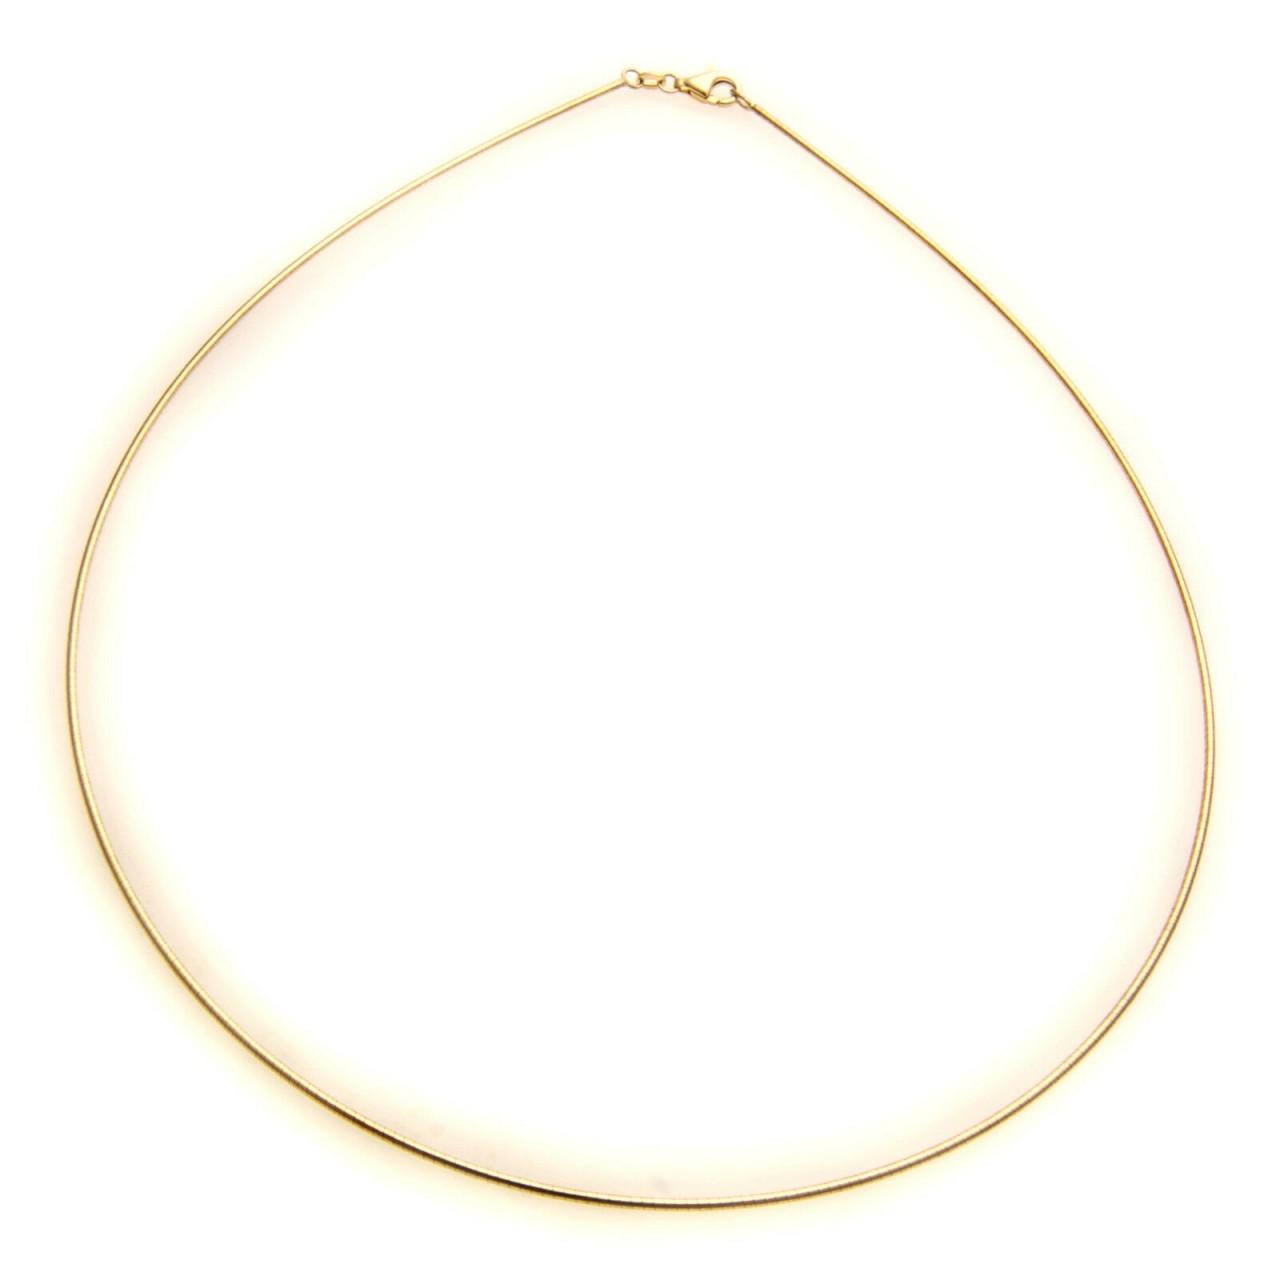 Damen Collier echt Gelbgold 585 14kt Halsreif Top Qualität Gold Halskette Tonda